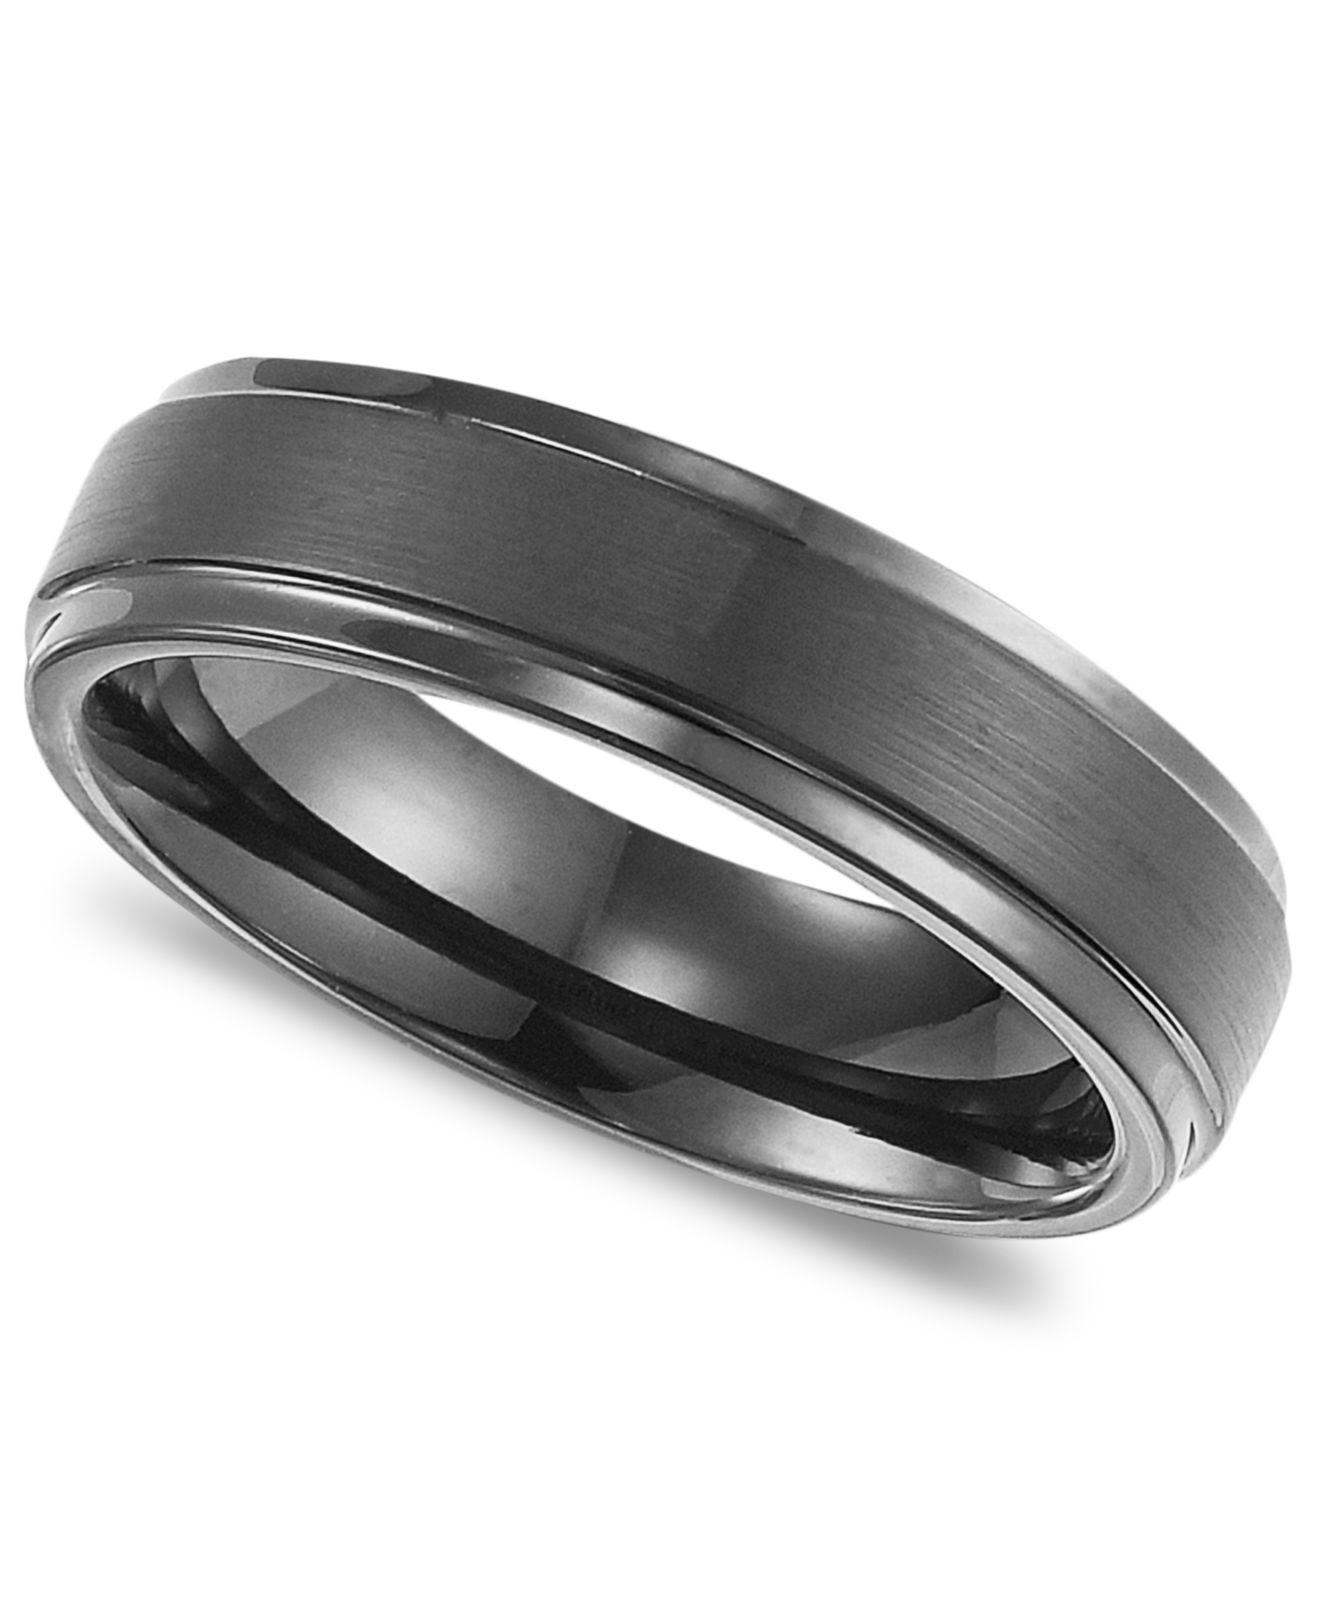 Macys Mens Wedding Rings 003 - Macys Mens Wedding Rings